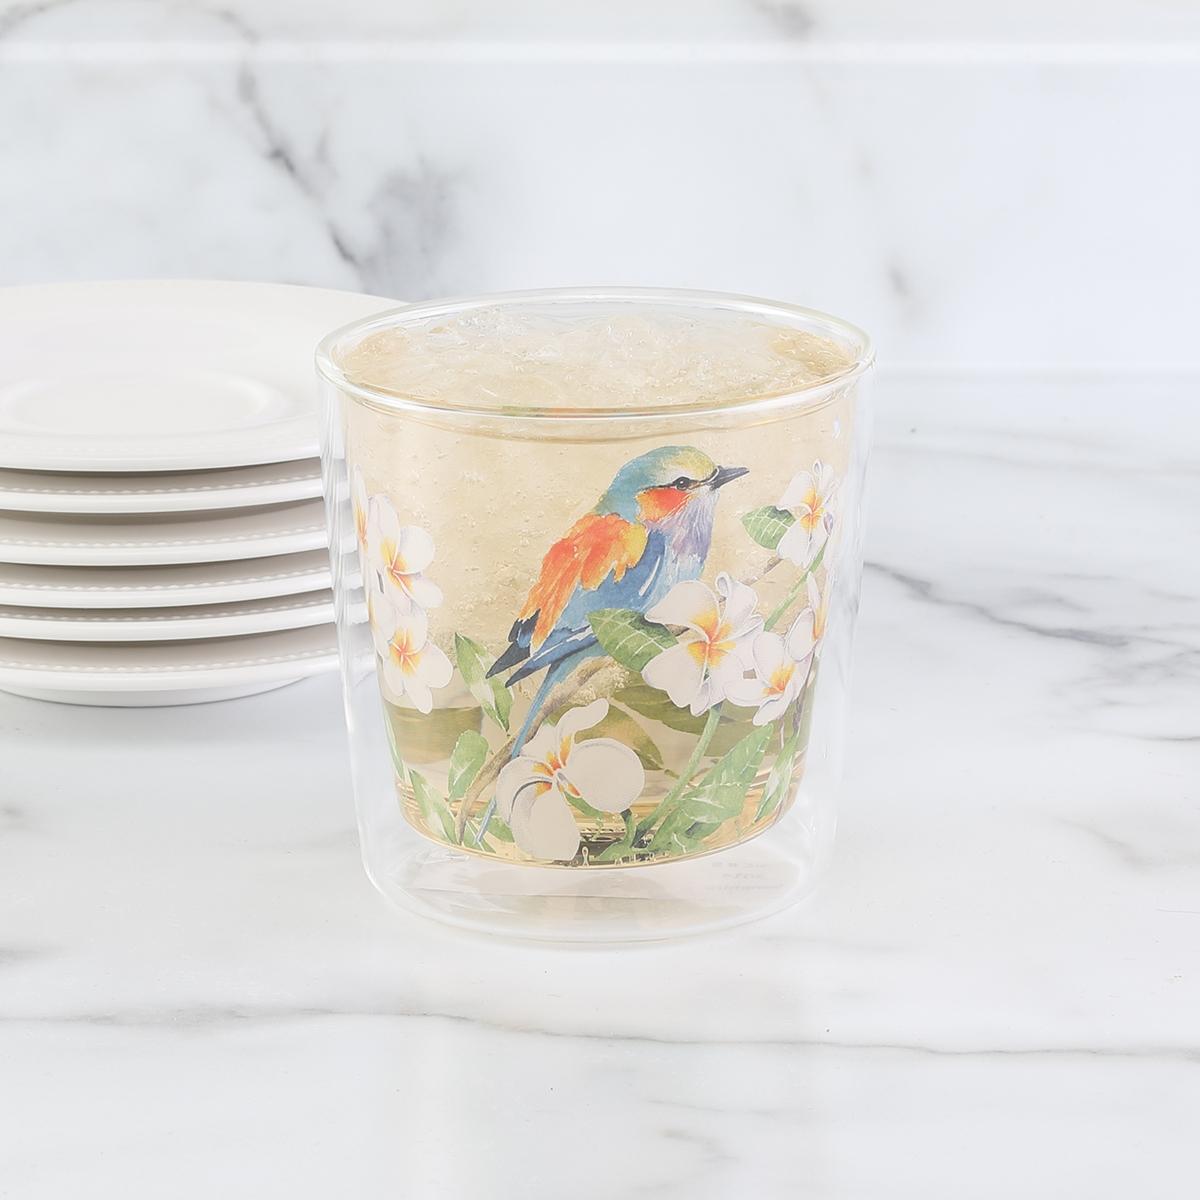 Songbird Insulated Glass